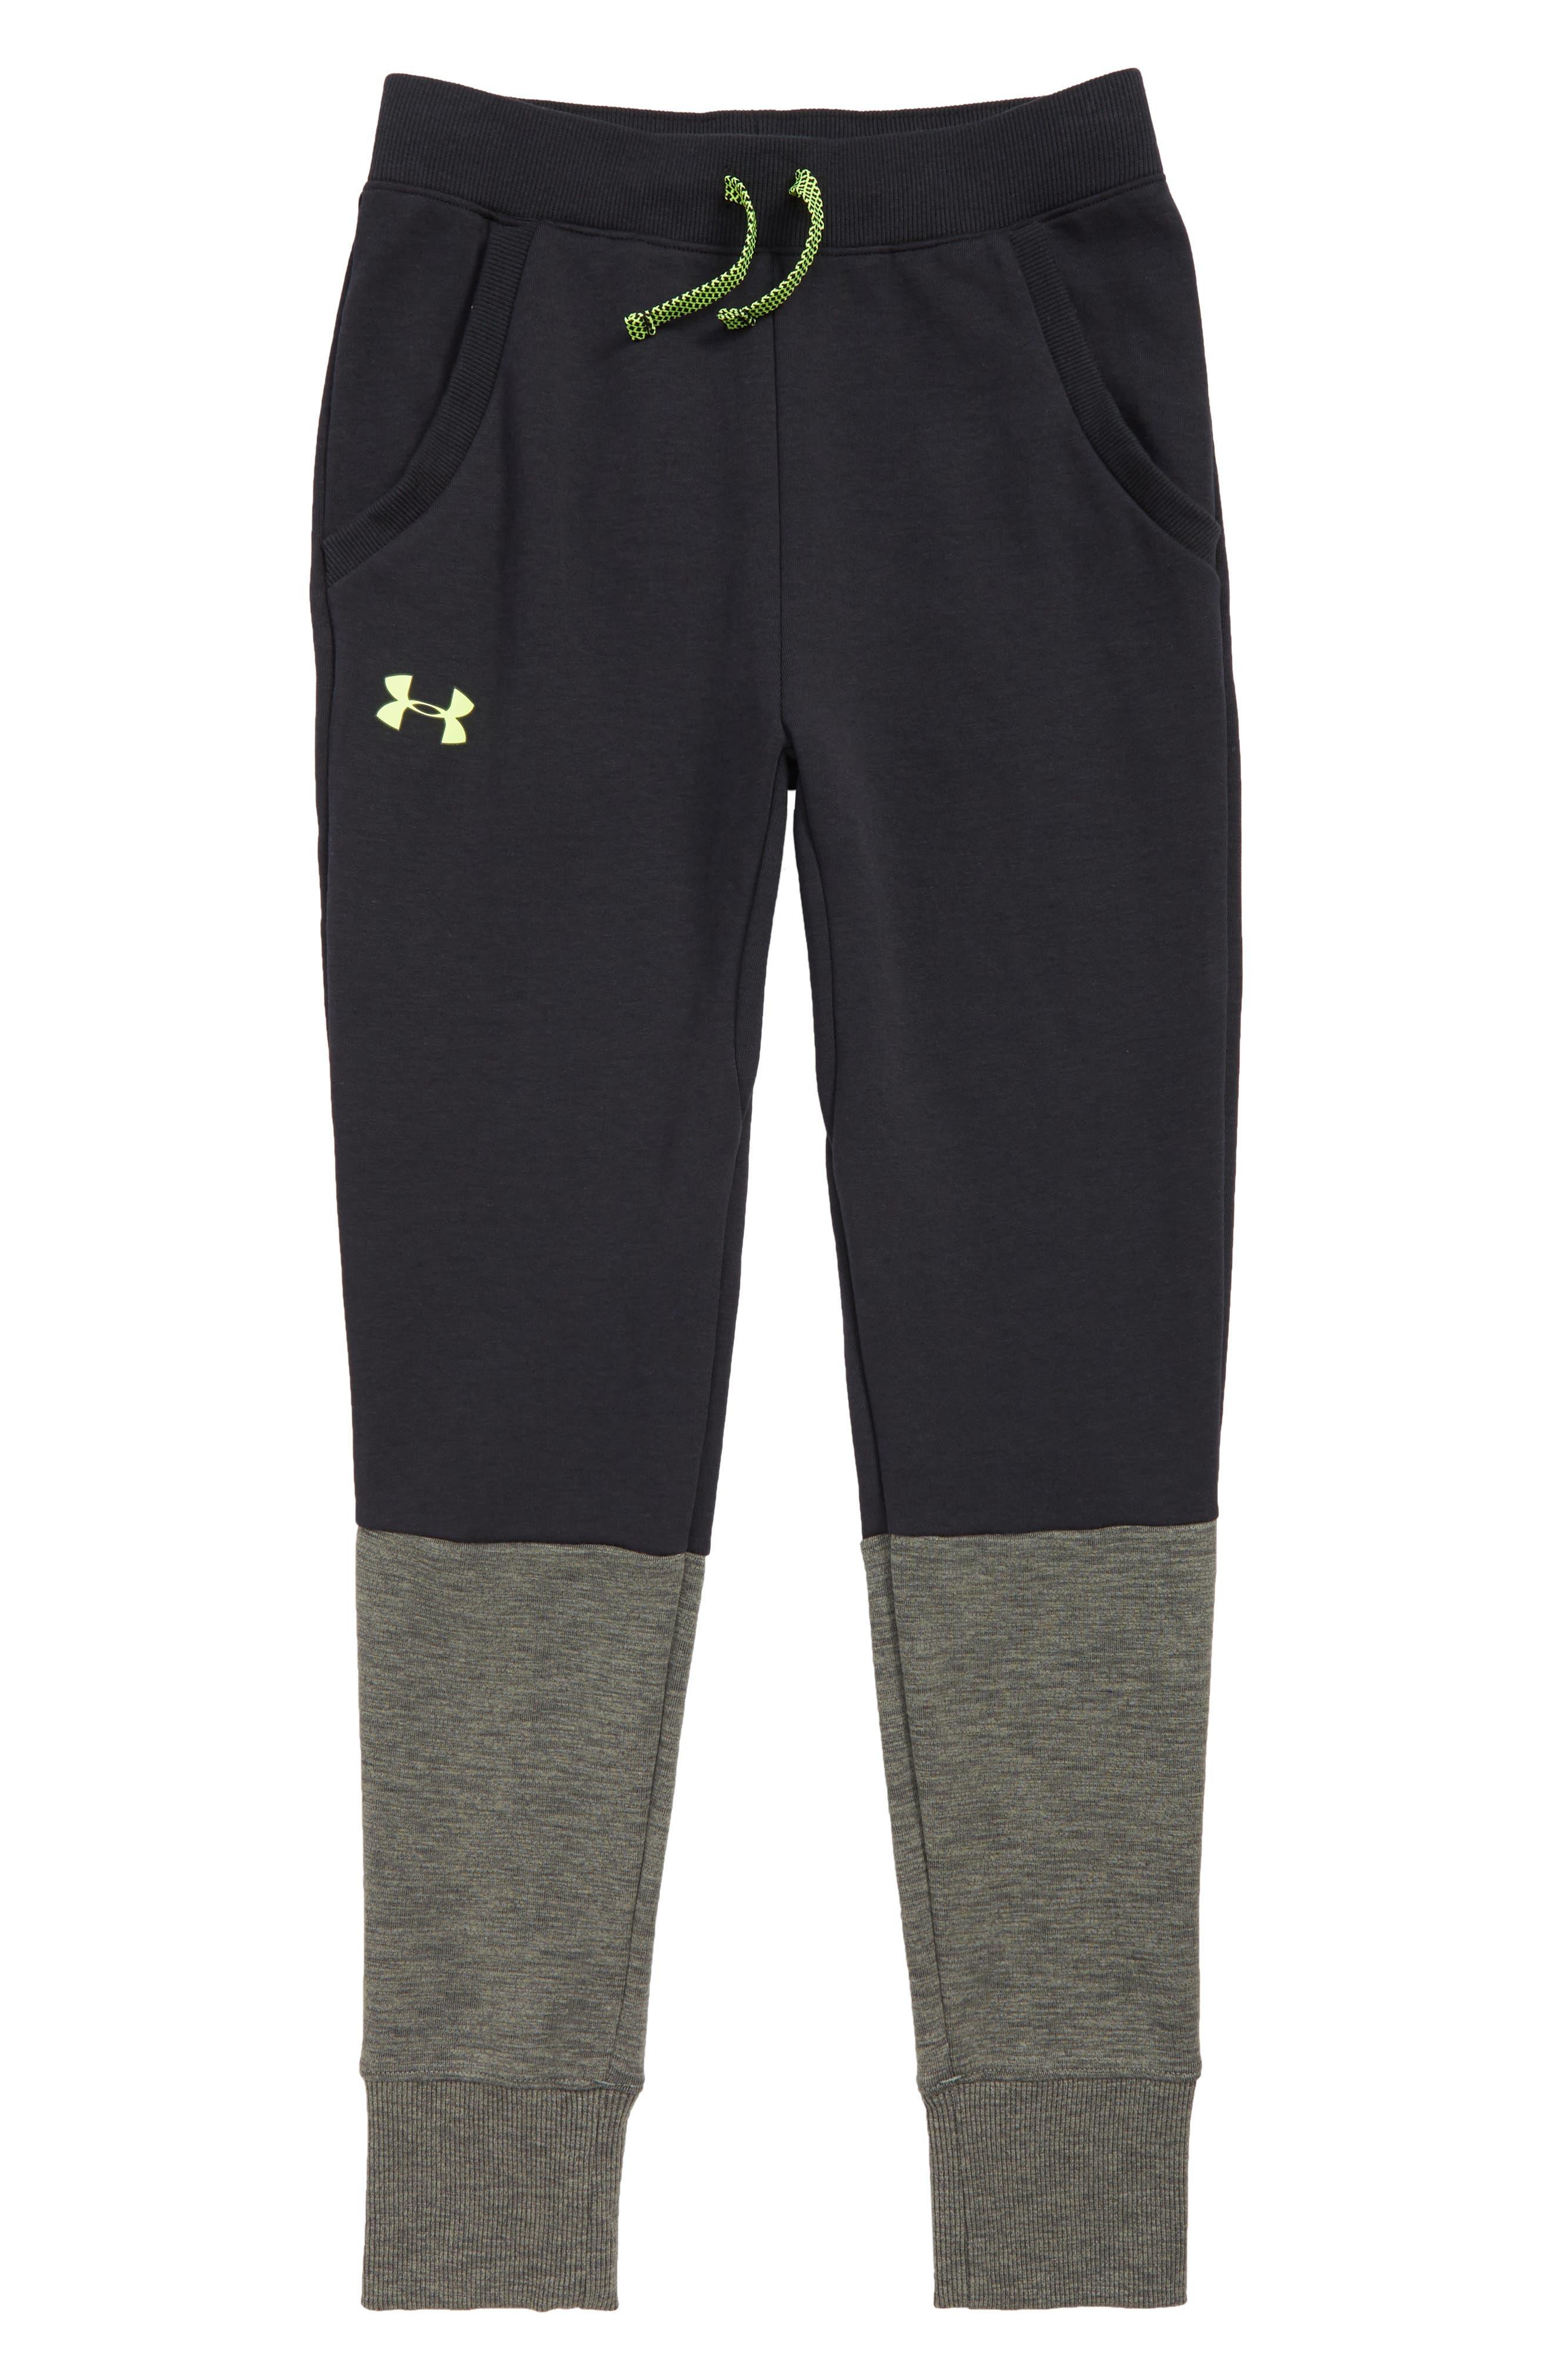 Double Knit Sweatpants,                             Main thumbnail 1, color,                             BLACK/ YELLOW